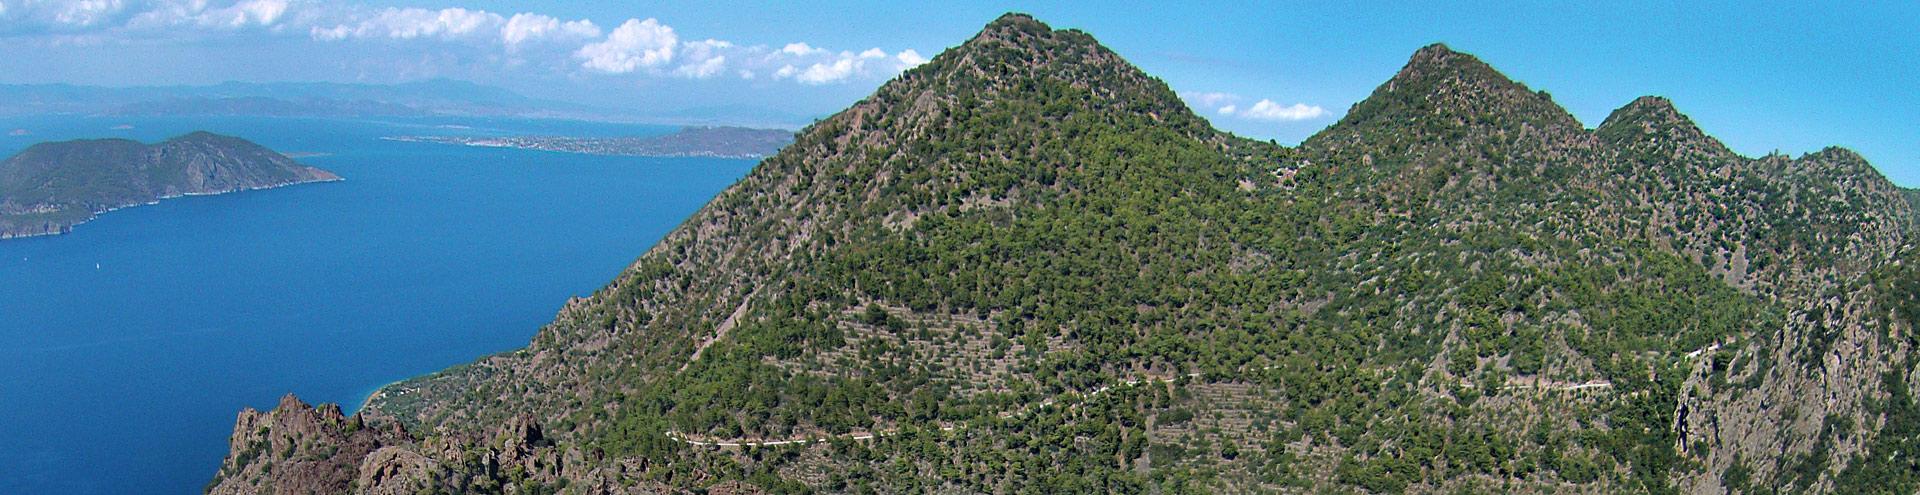 Der Vulkan Malia Gliati